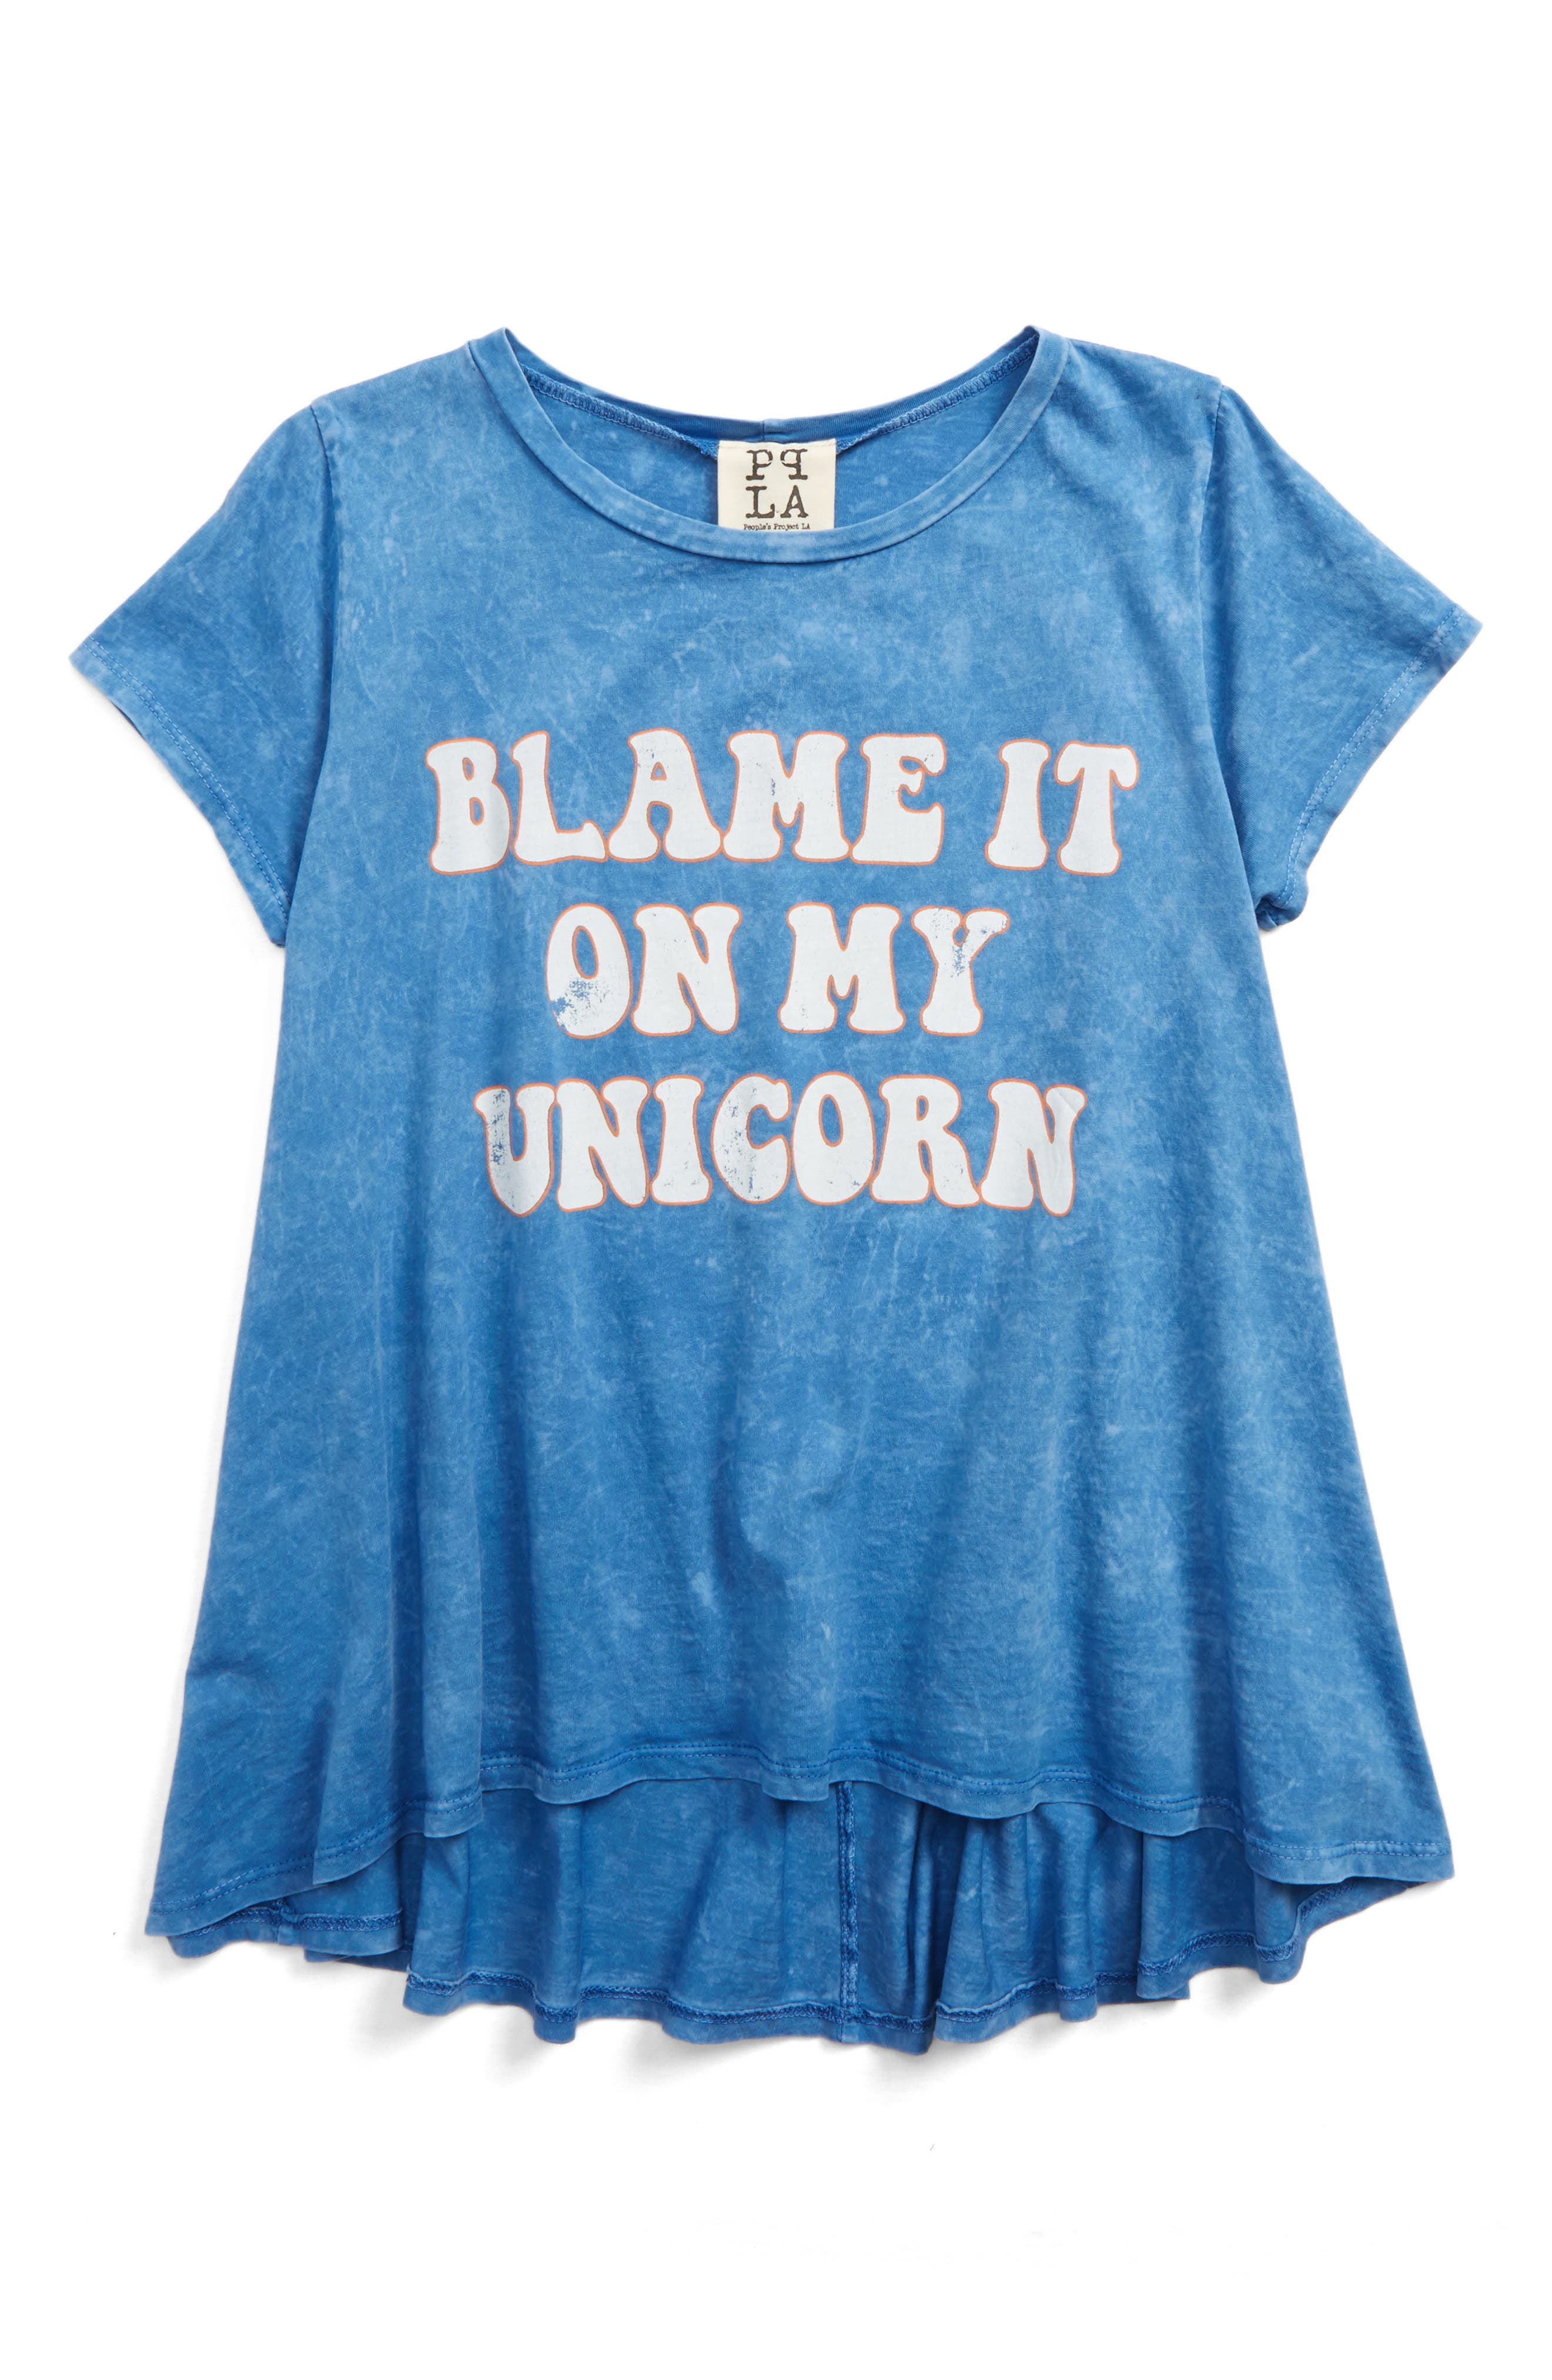 PPLA Blame It On My Unicorn Graphic Tee (Big Girls)